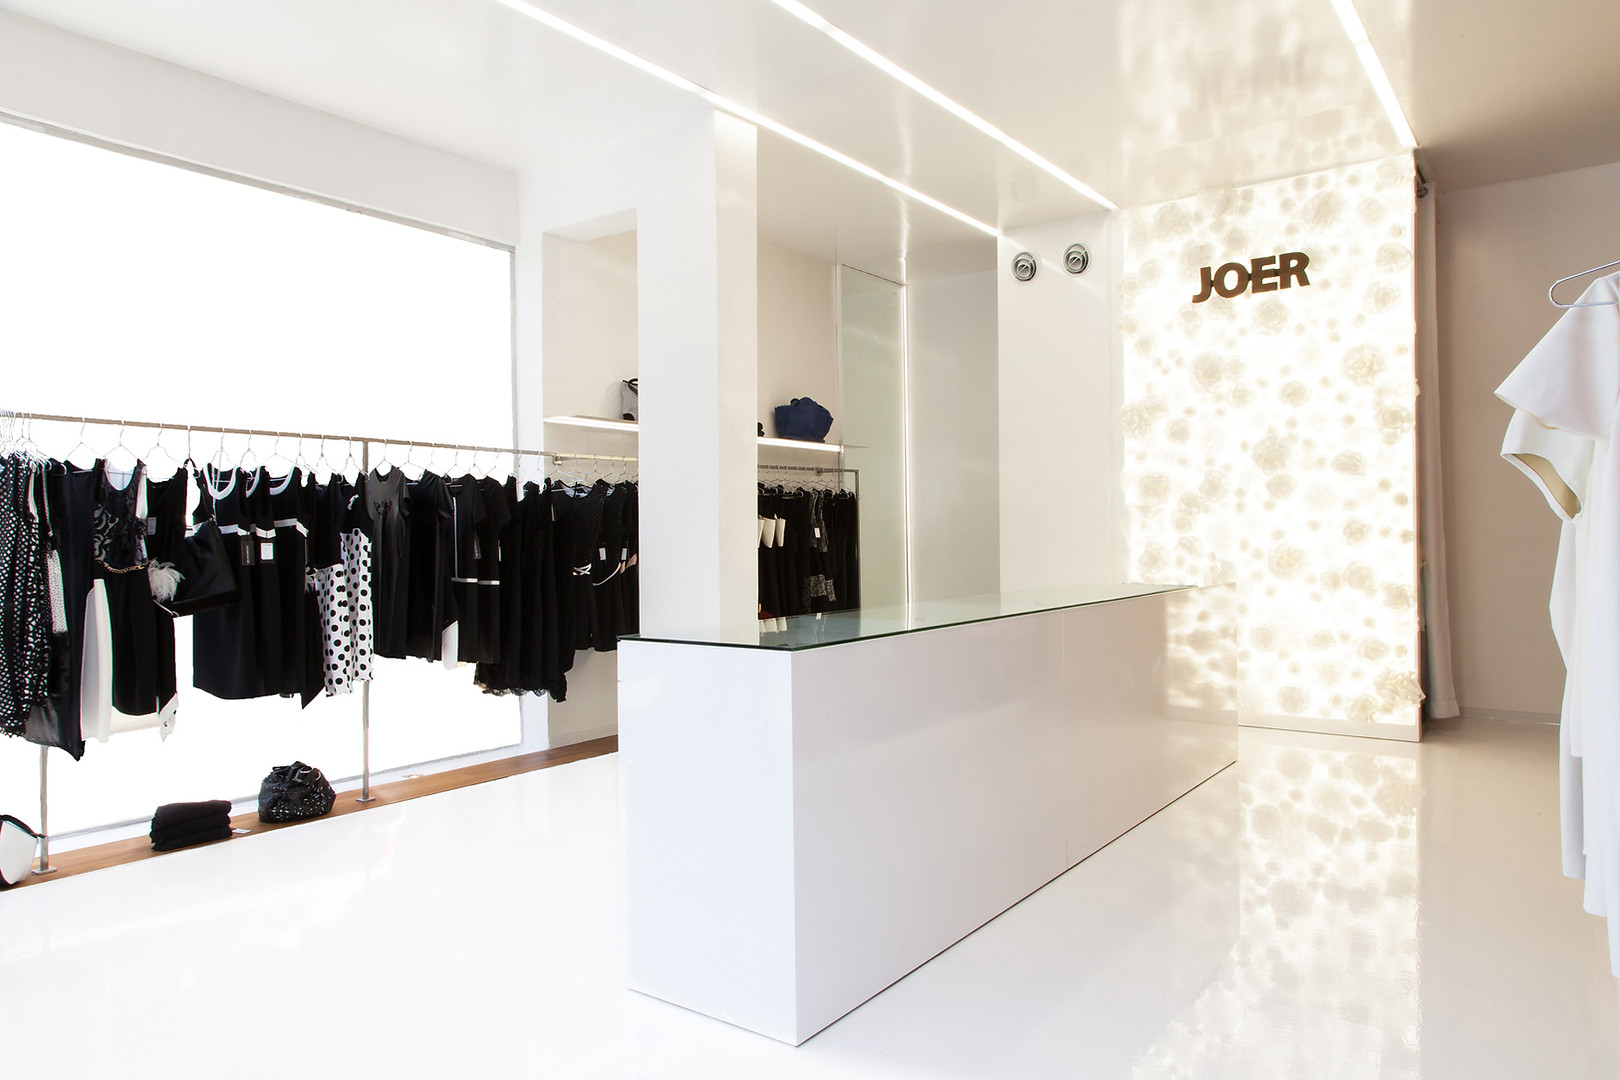 Joer 1 | חנות אופנה בתל אביב